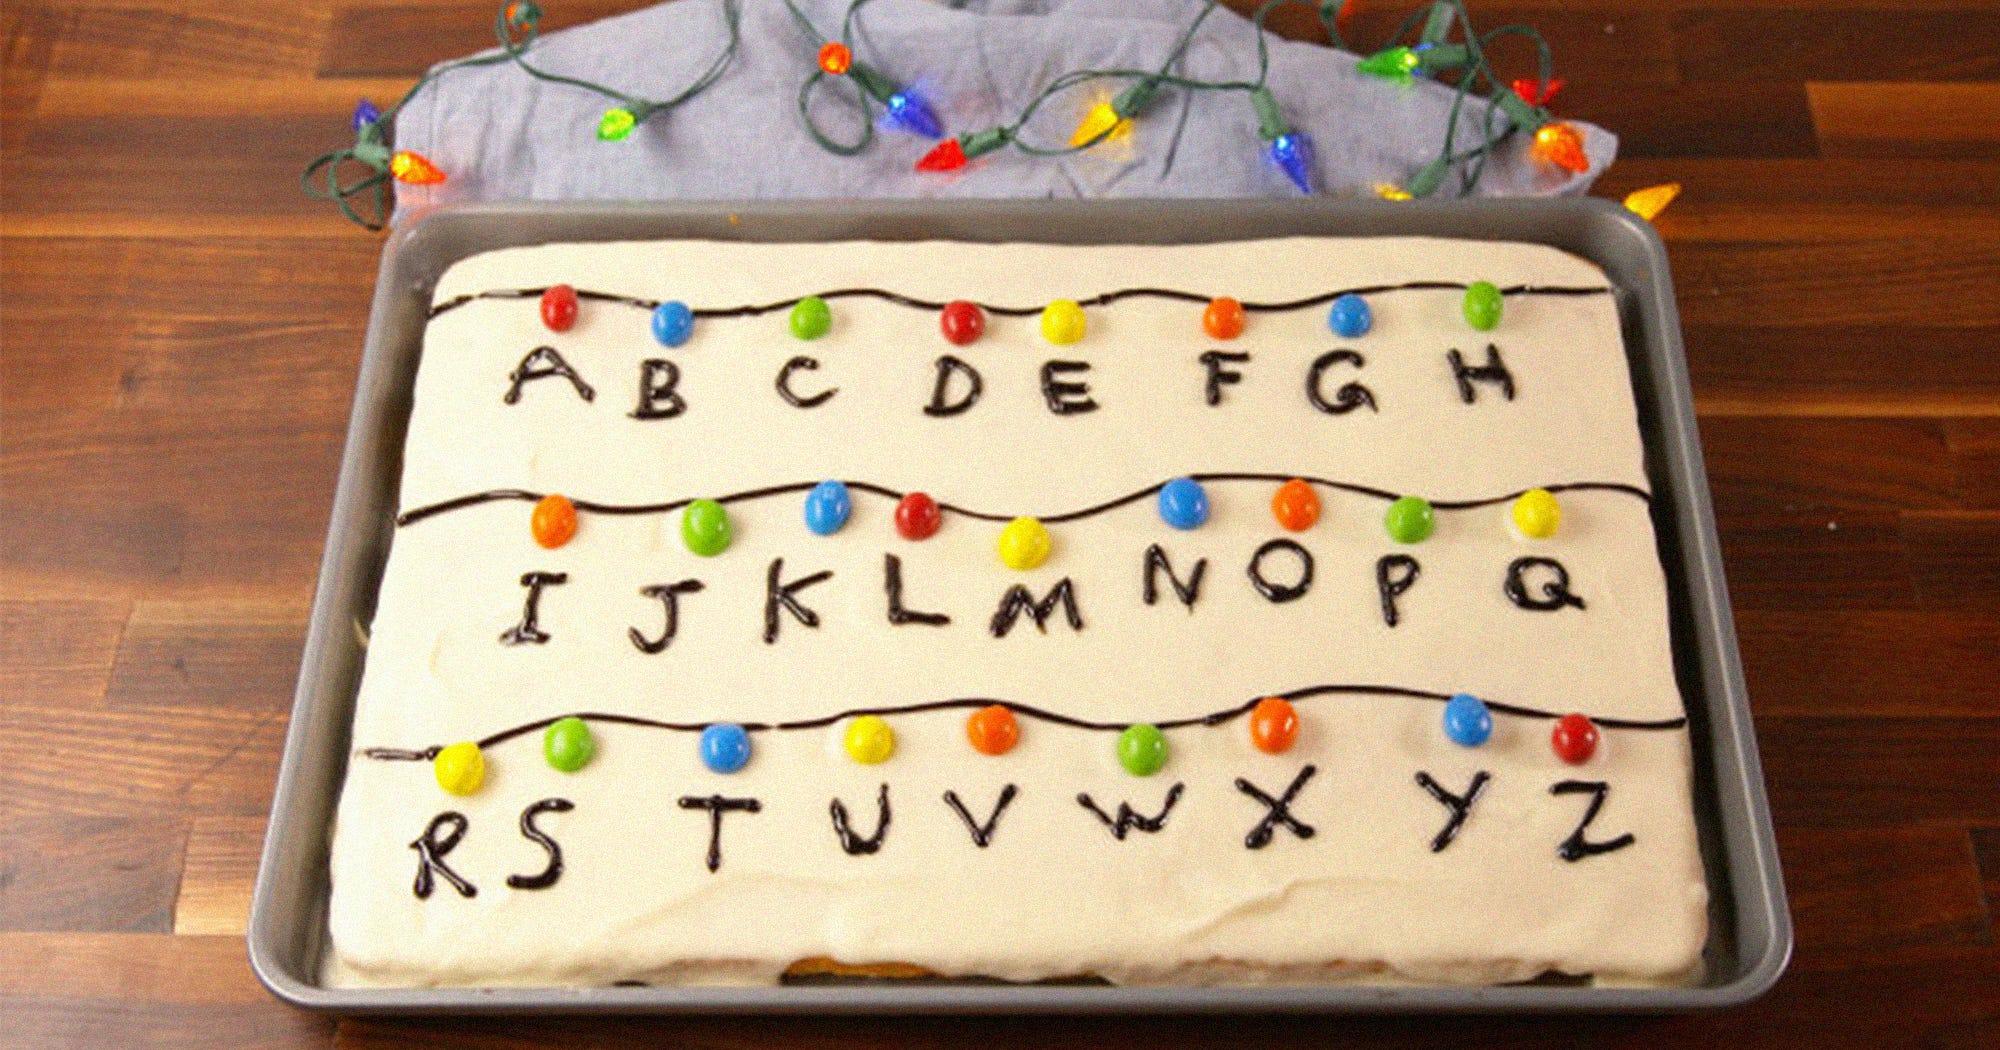 Stranger Things Cake Is Perfect Halloween Dessert